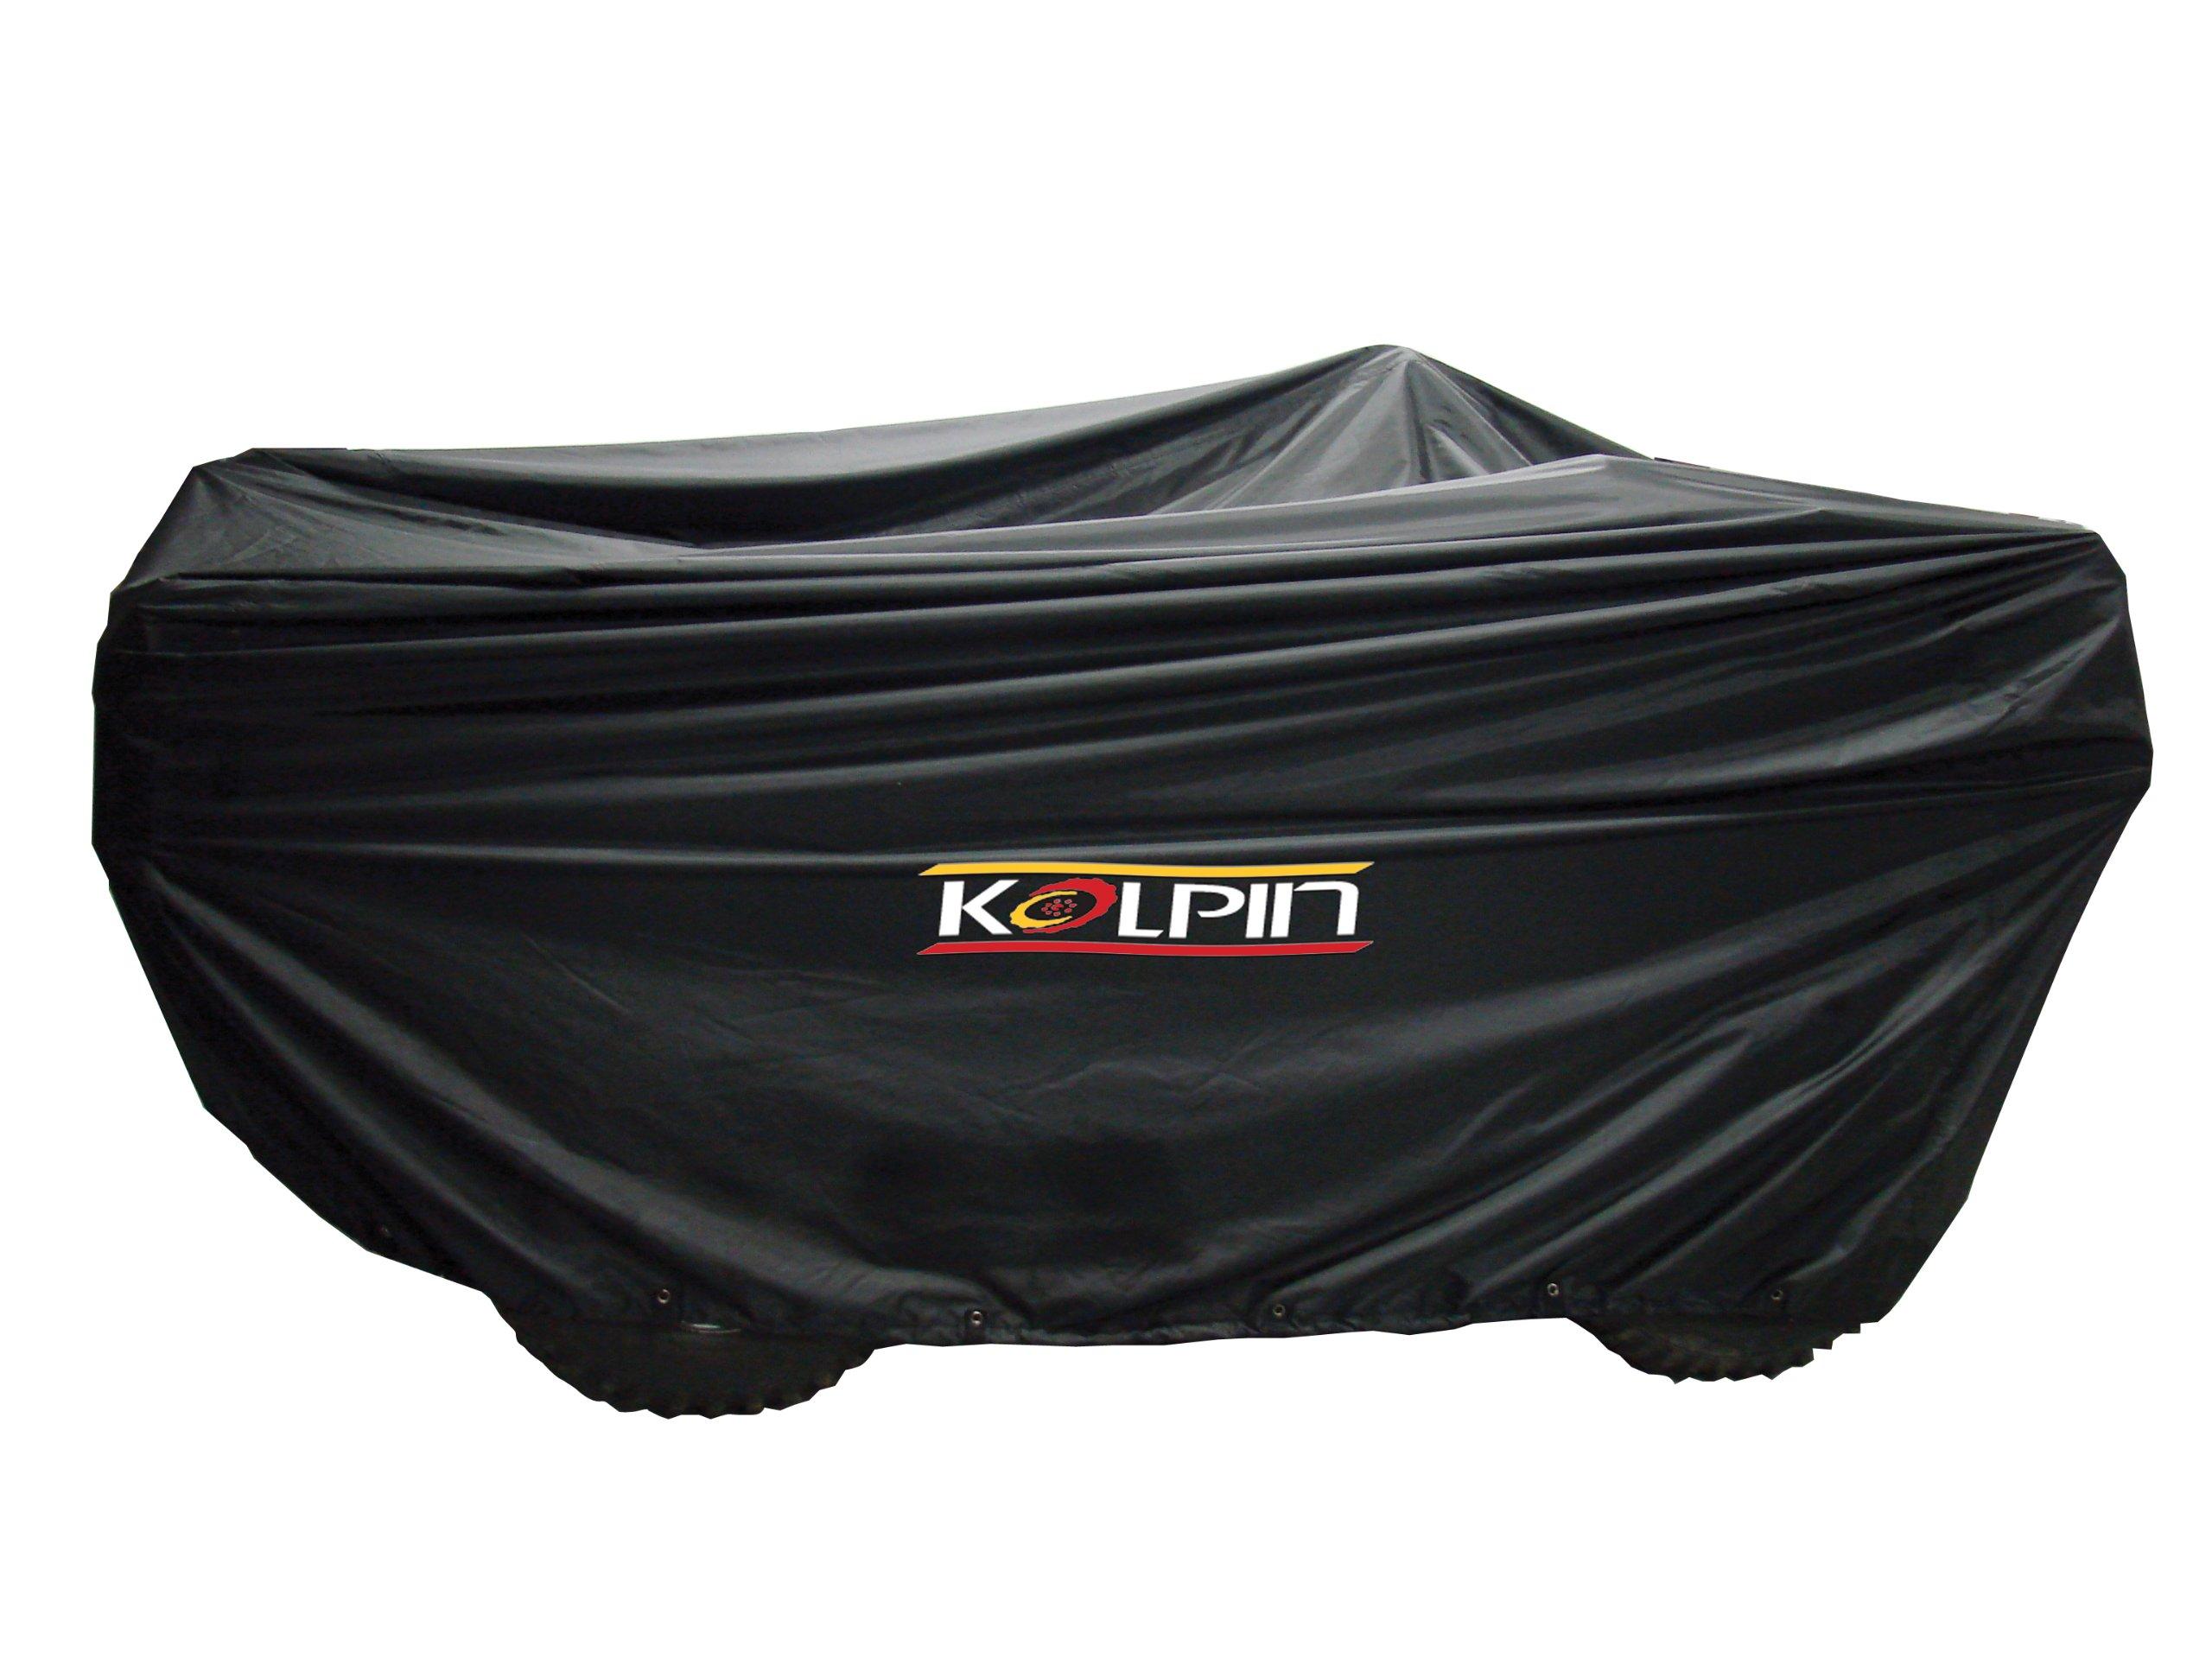 Kolpin Black XX-Large ATV Cover - 95104 by Kolpin